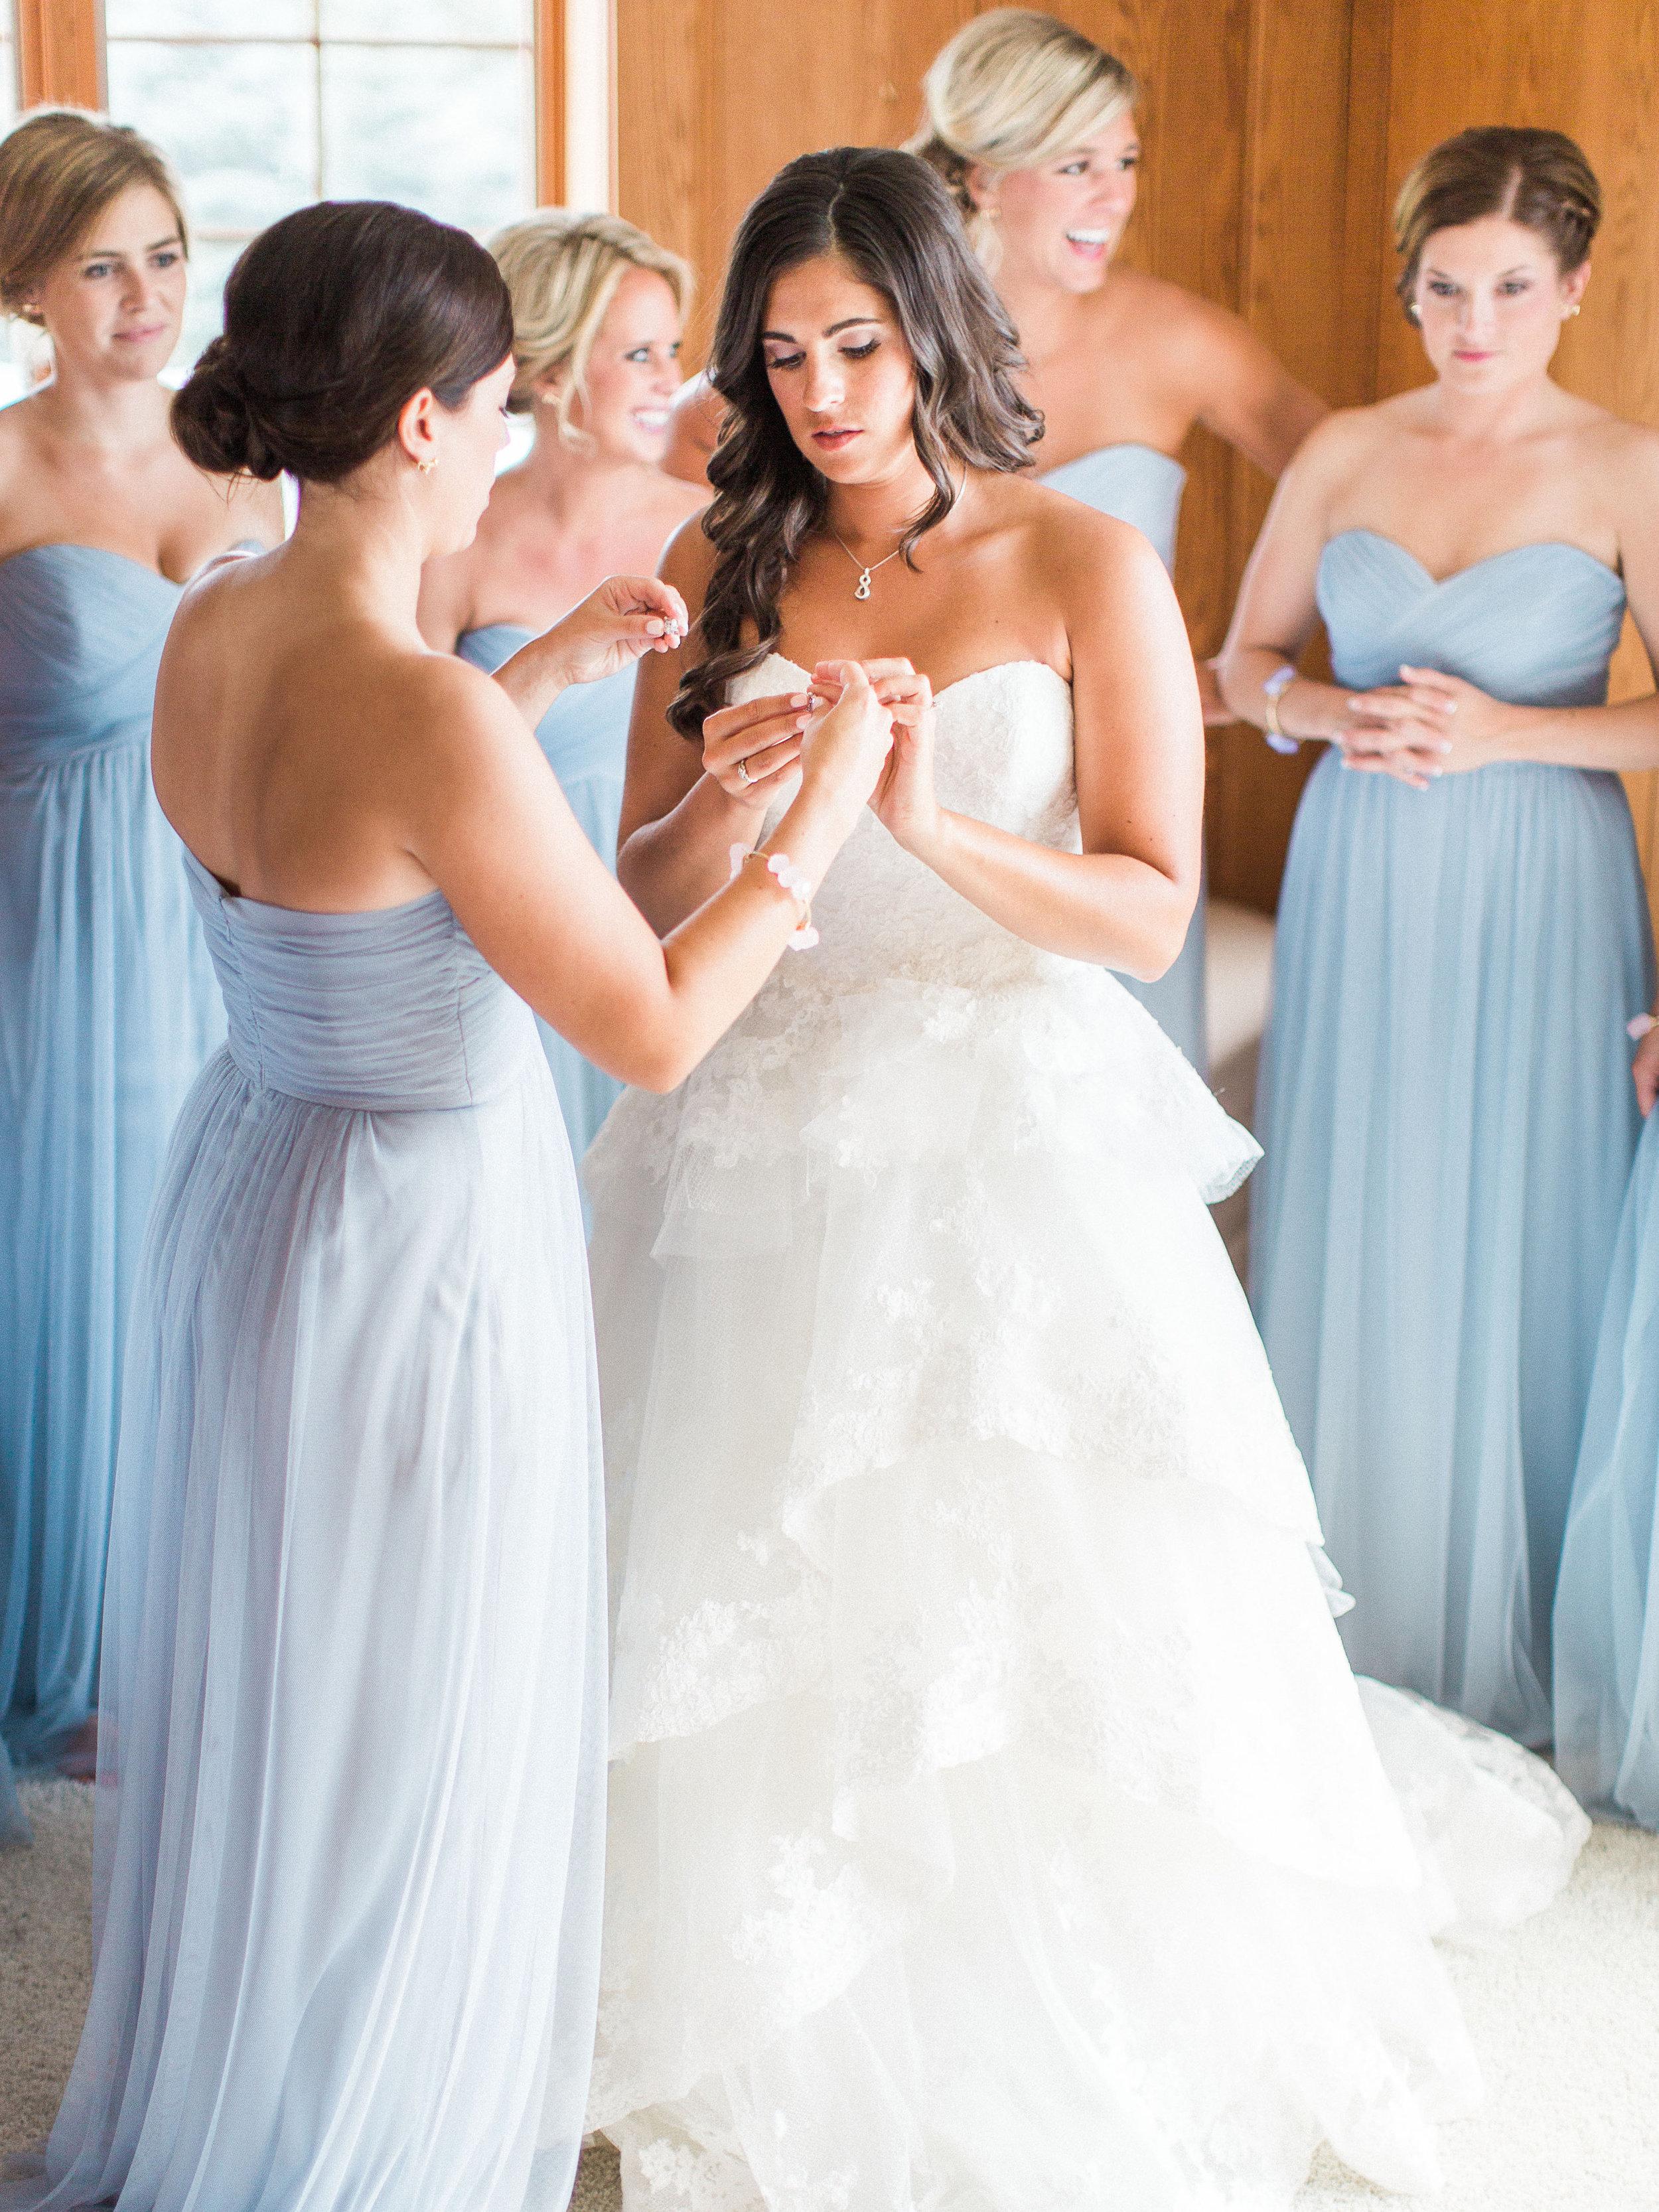 ERIC AND HALLIE WEDDING-HI RESOLUTION FOR PRINTING-0162.jpg